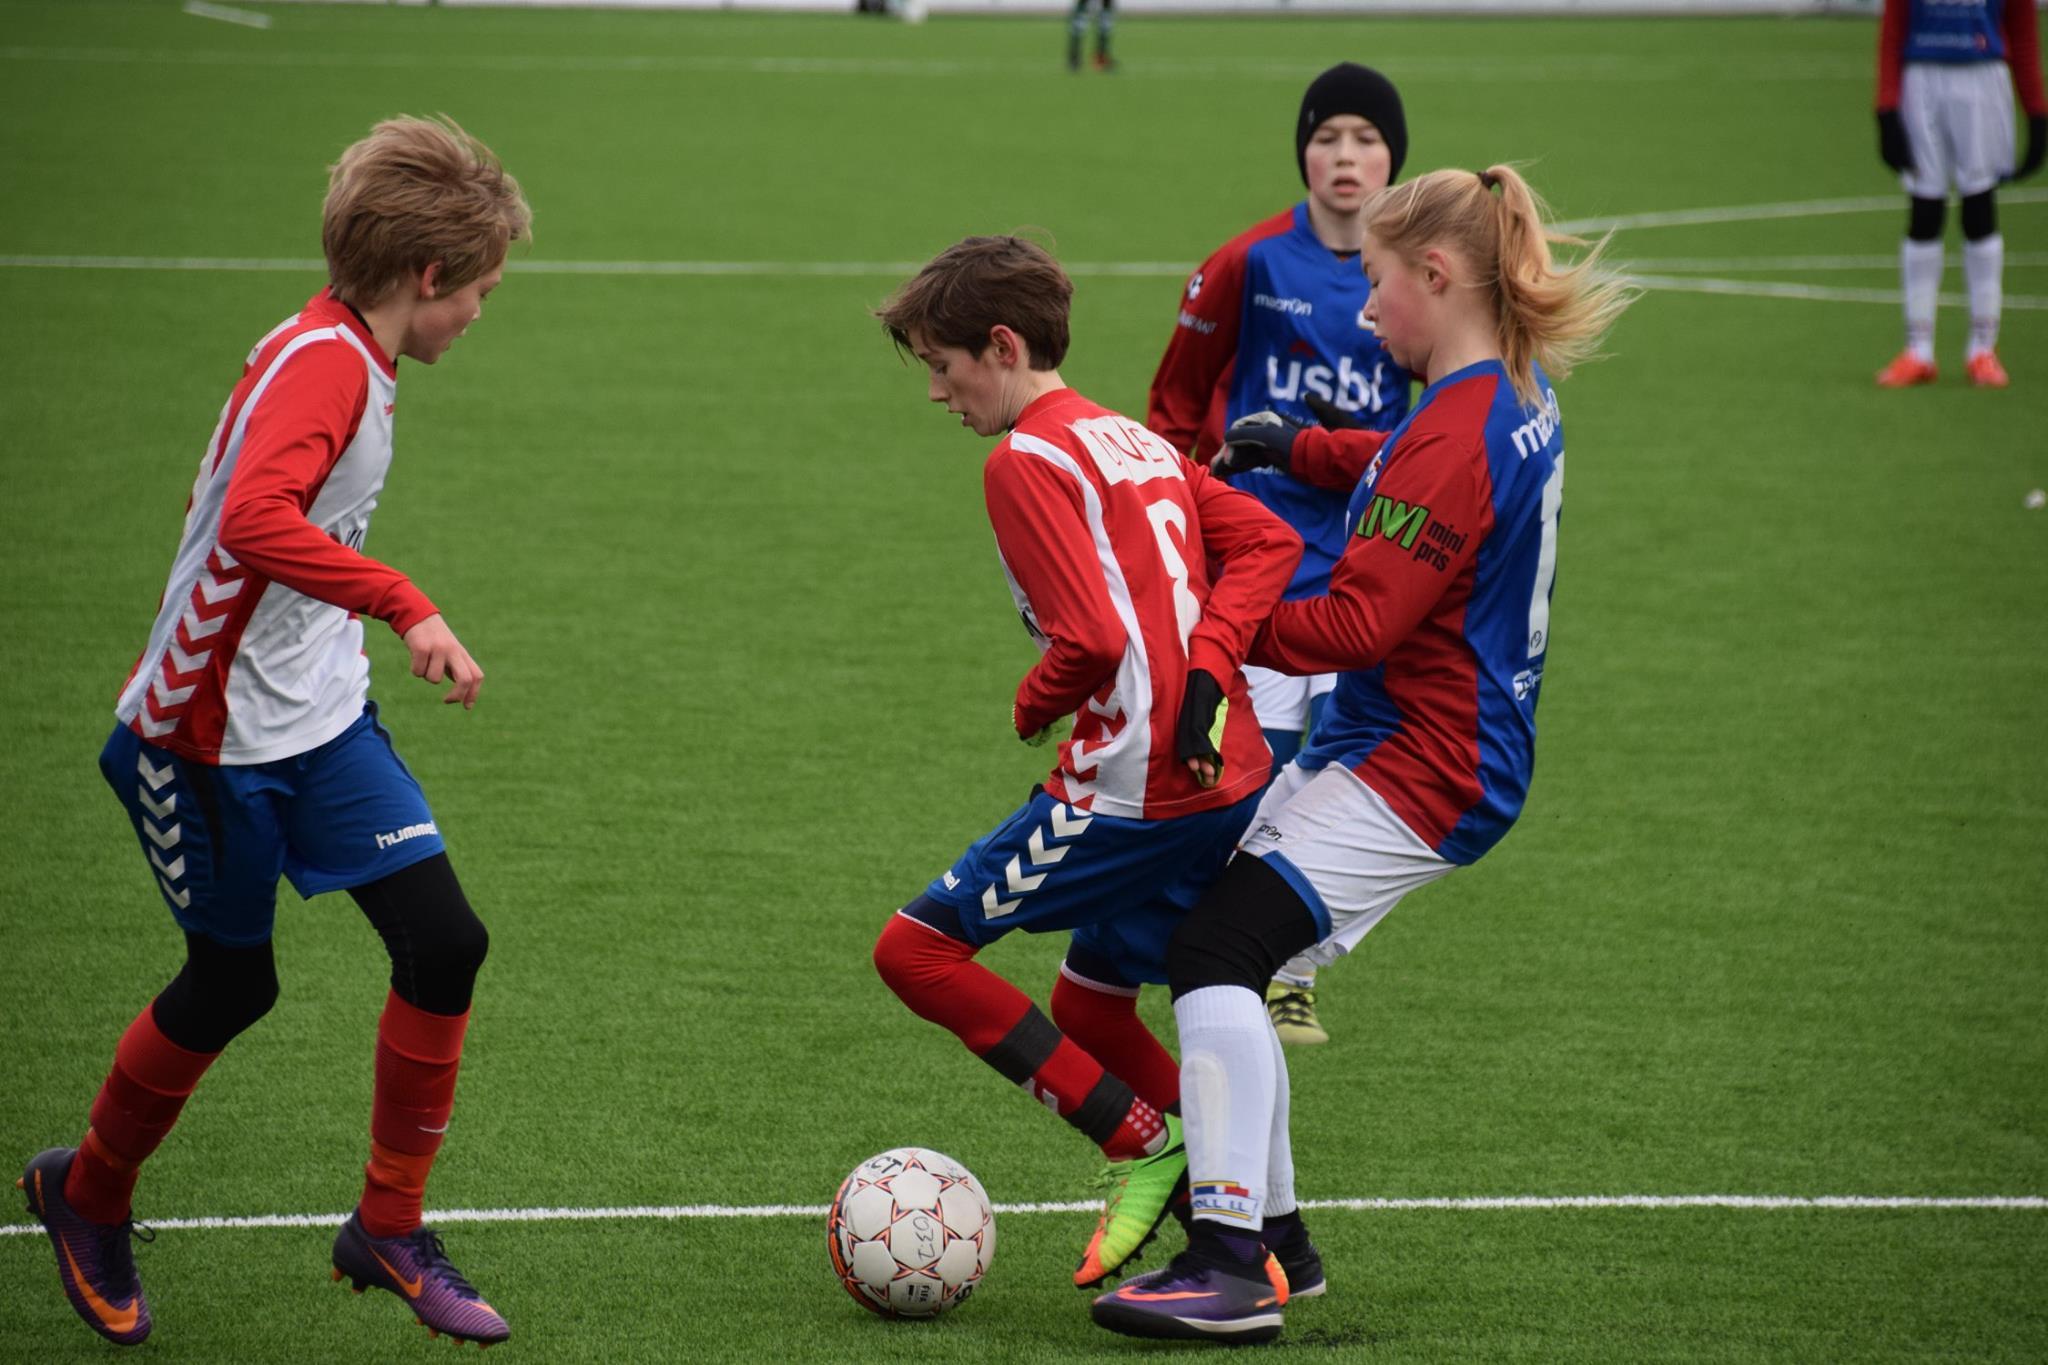 Mads Foss Aaserud var meget god for Lyn G03.1 mot Årvoll. En kamp Lyn vant hele 5-0.